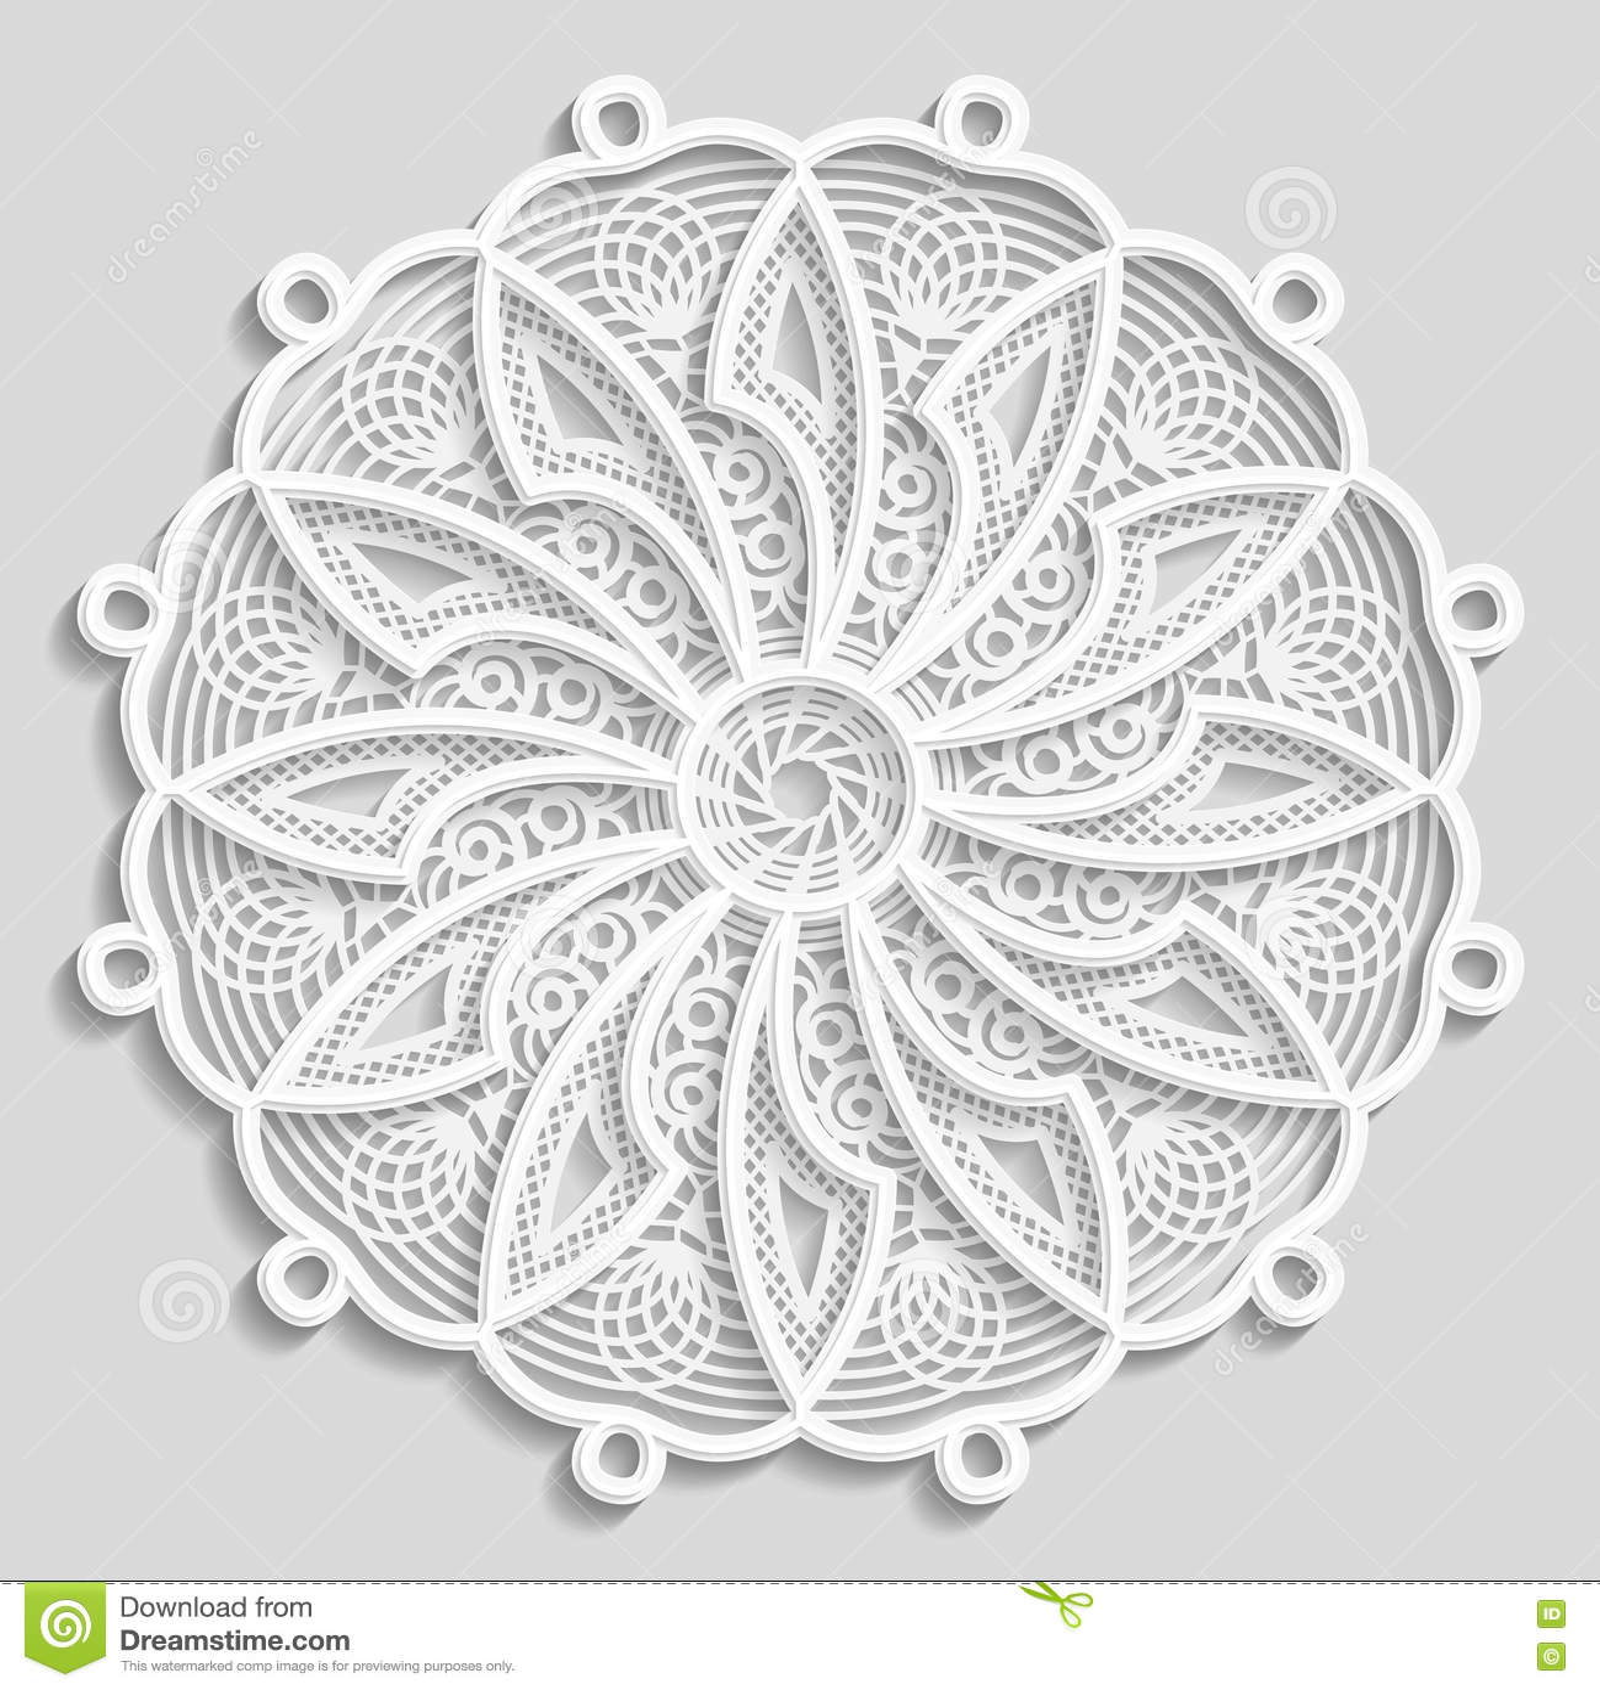 Lacy Paper Doily, Decorative Flower, Decorative Snowflake ...